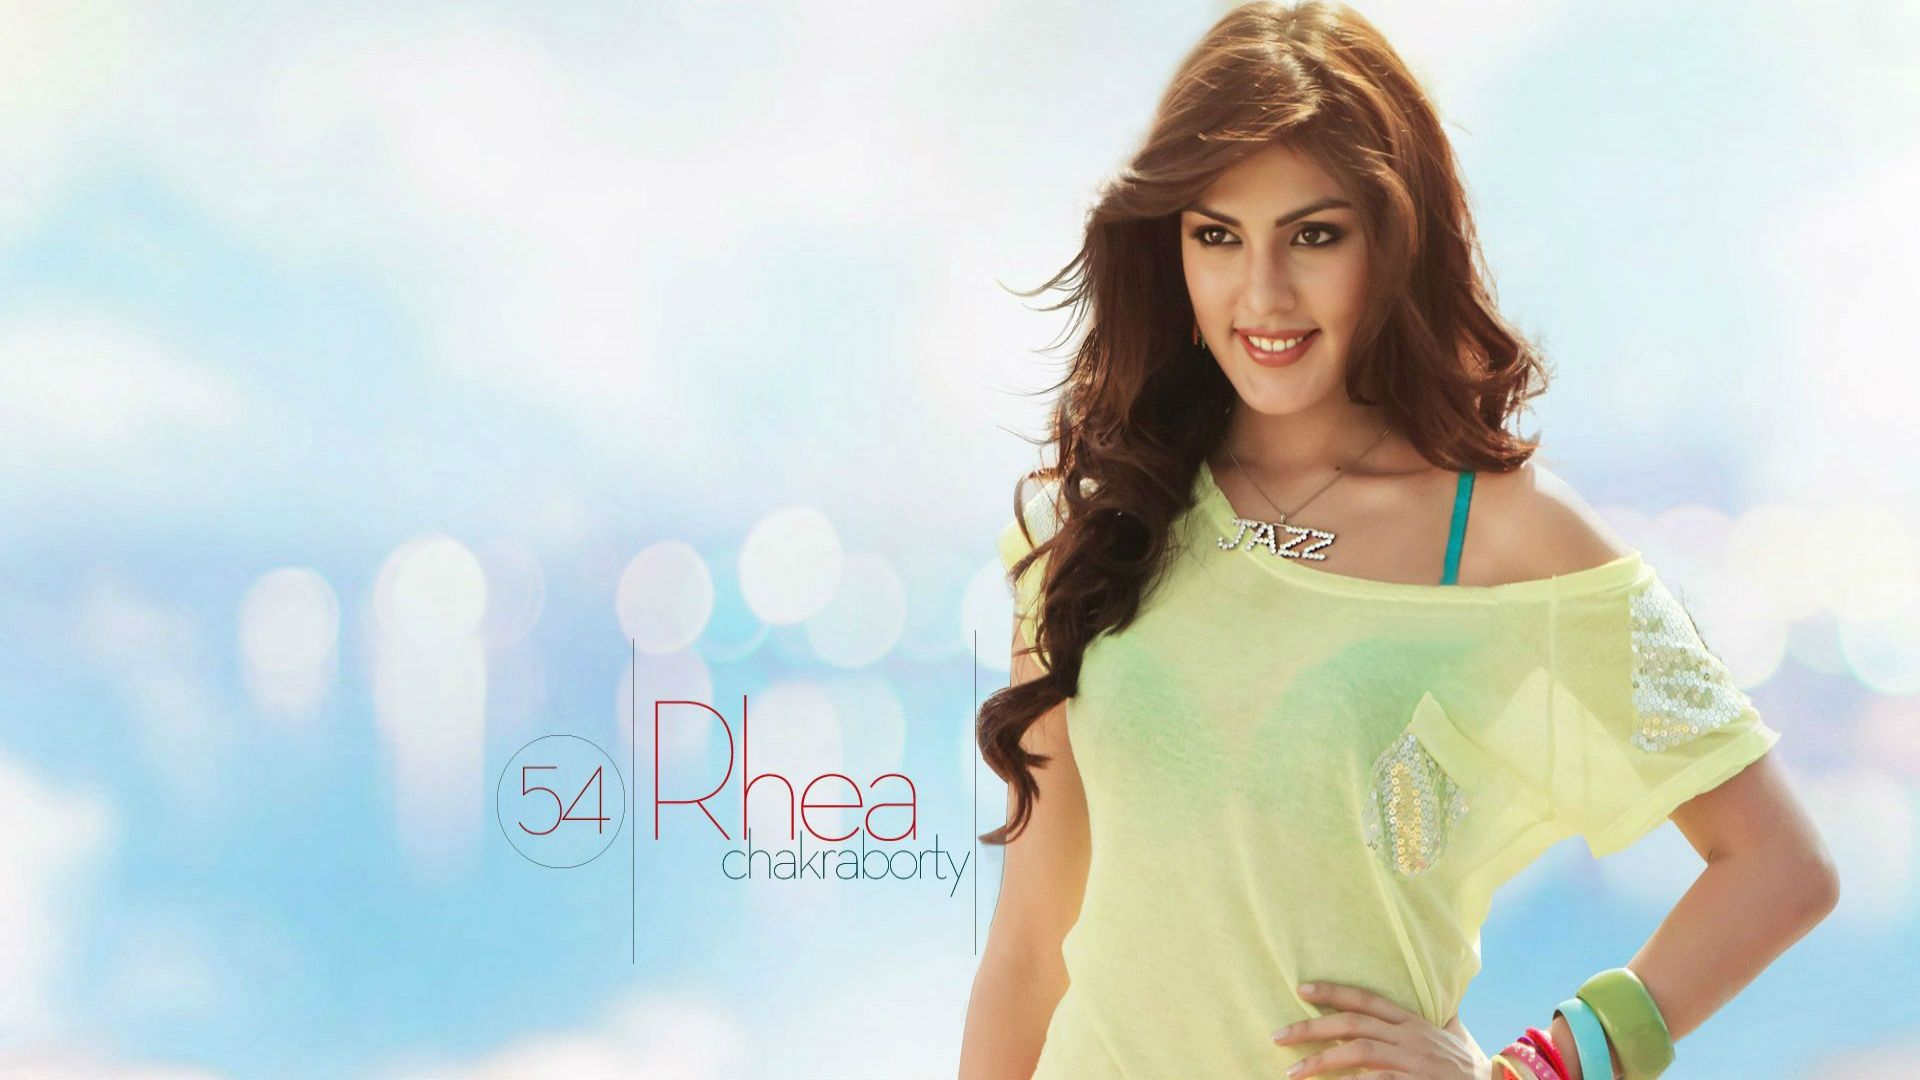 rhea chakraborty   models   pinterest   models